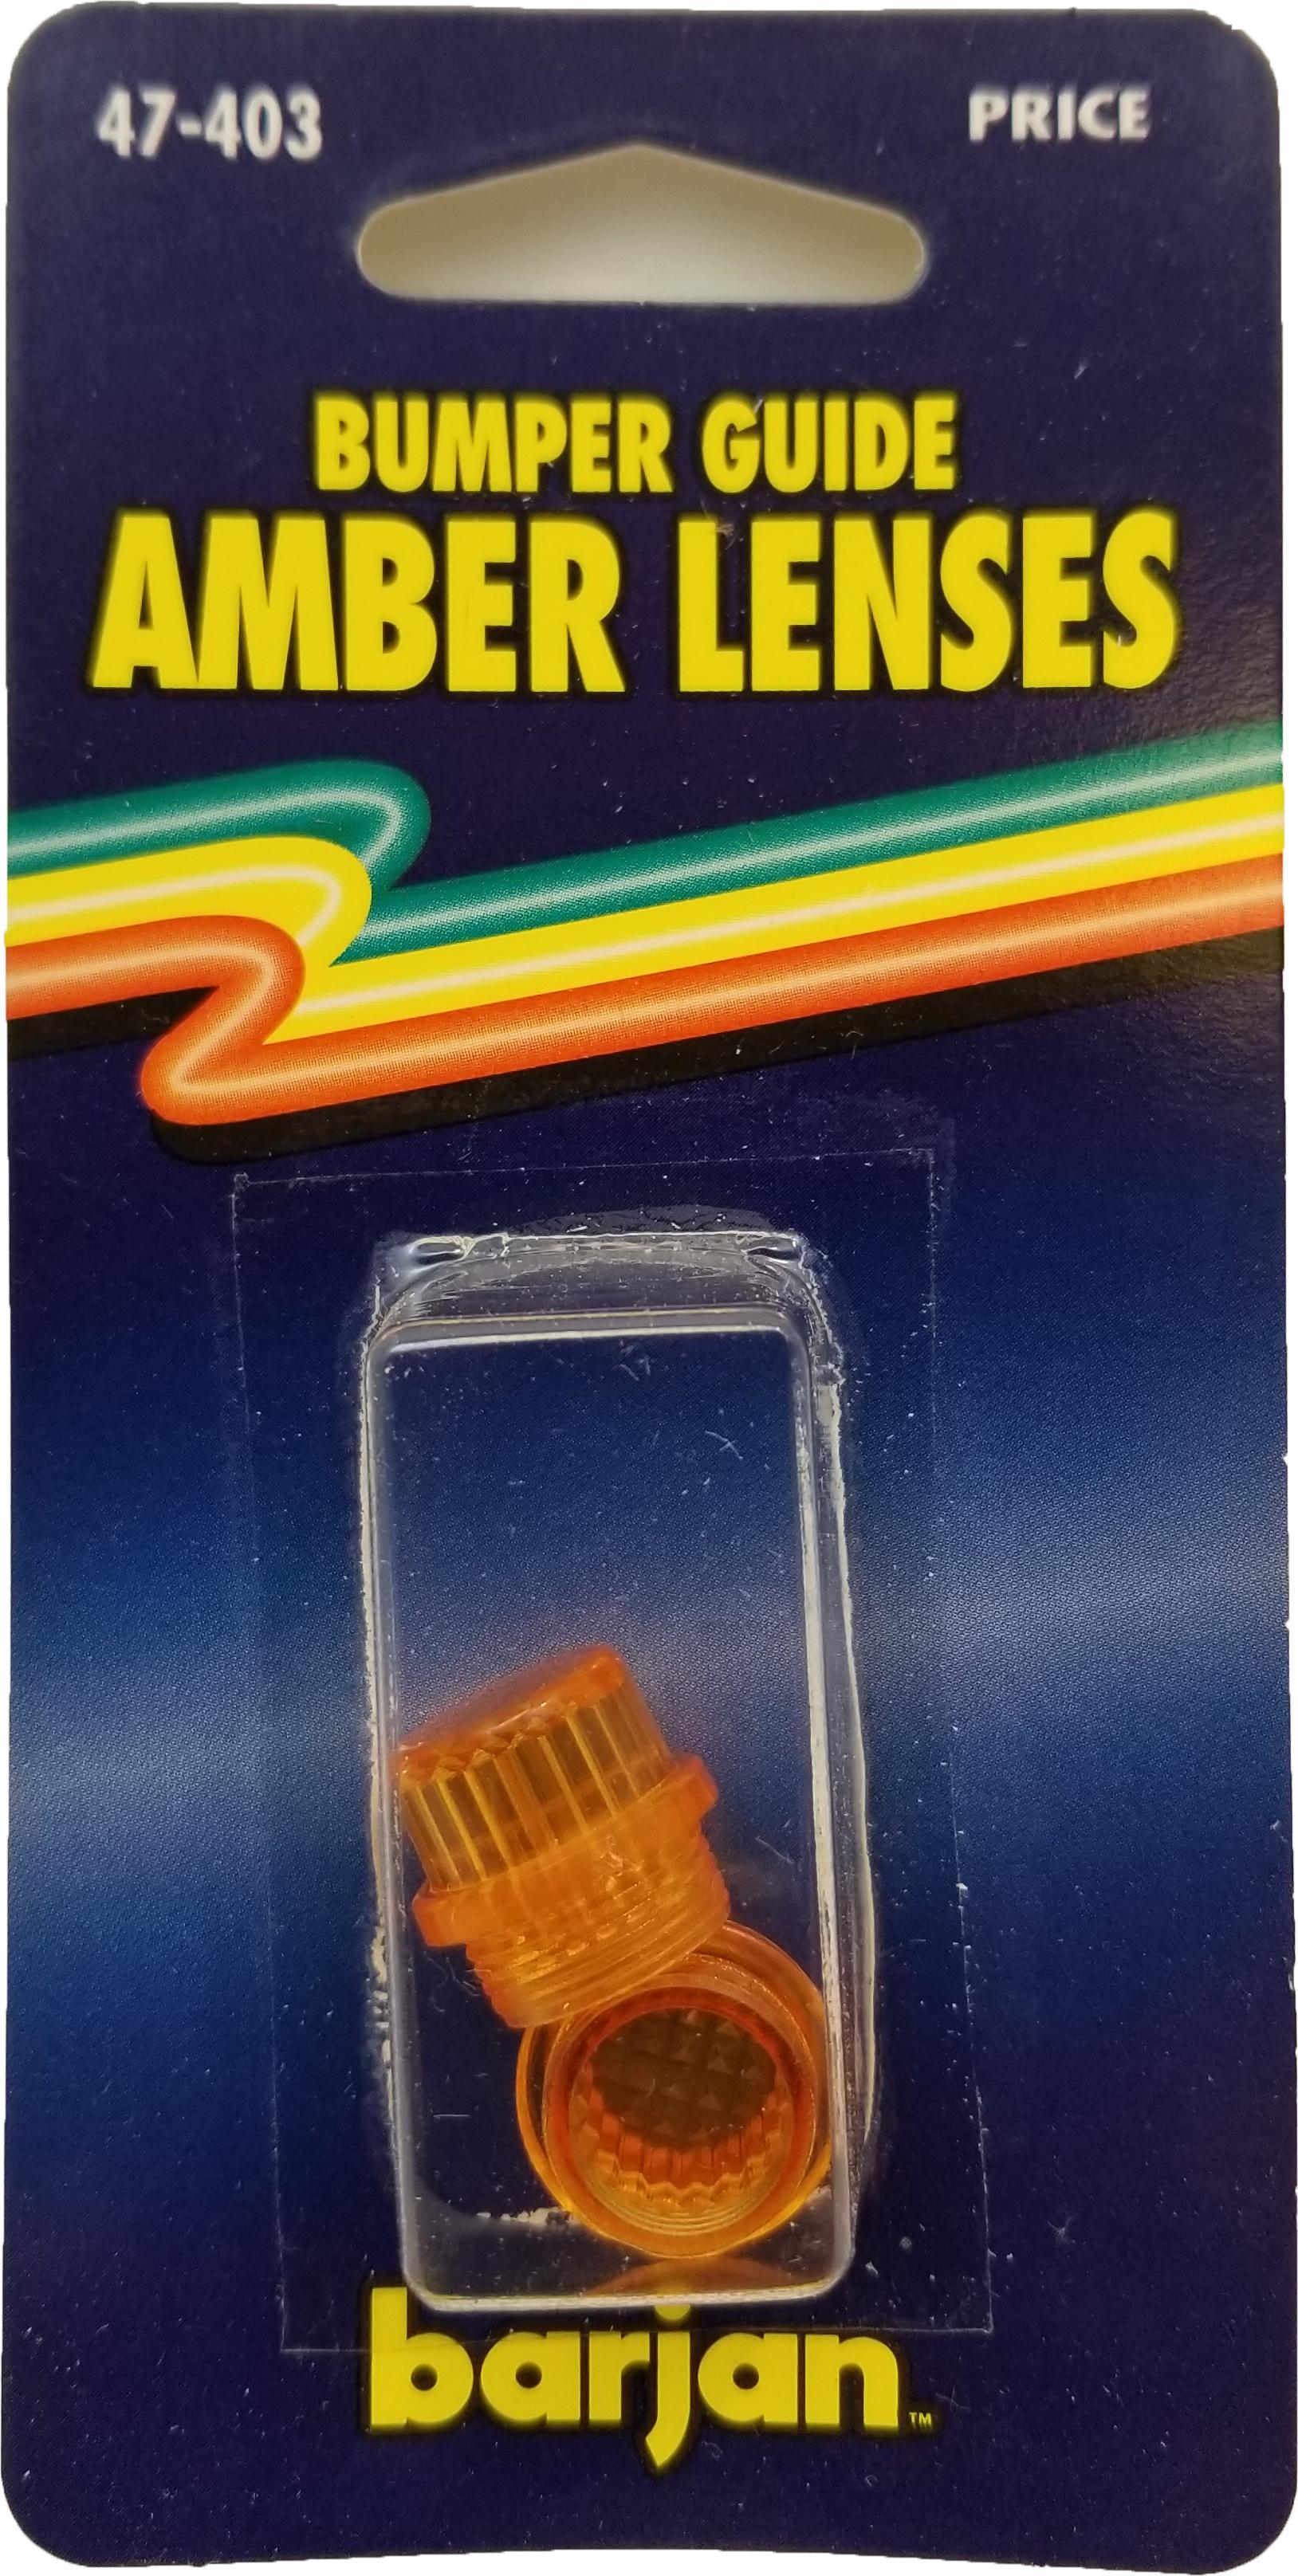 047403 - Bumper Guide Amber Lenses 2 Caps/Card